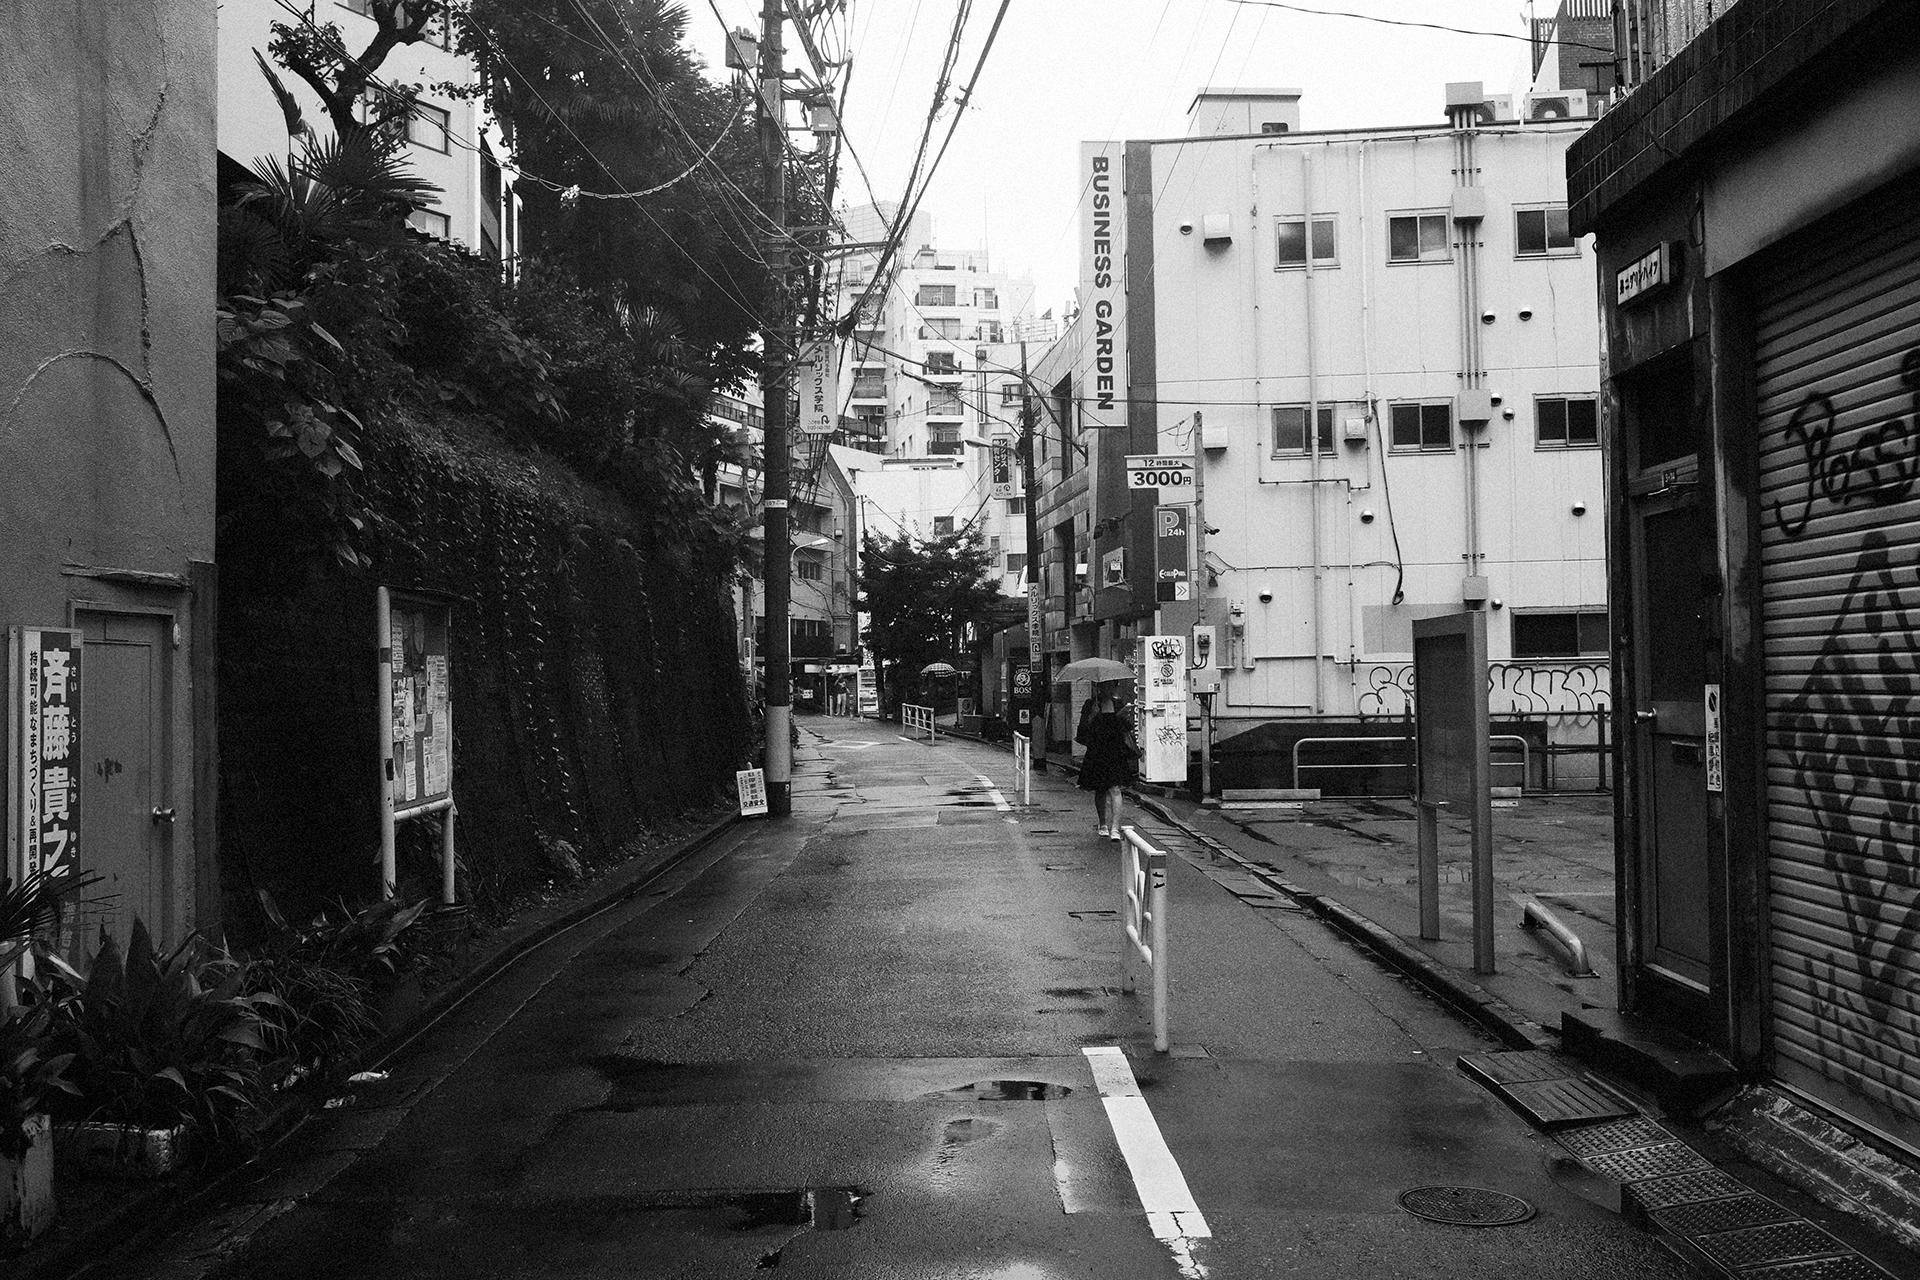 笠井 爾示  Chikashi Kasai